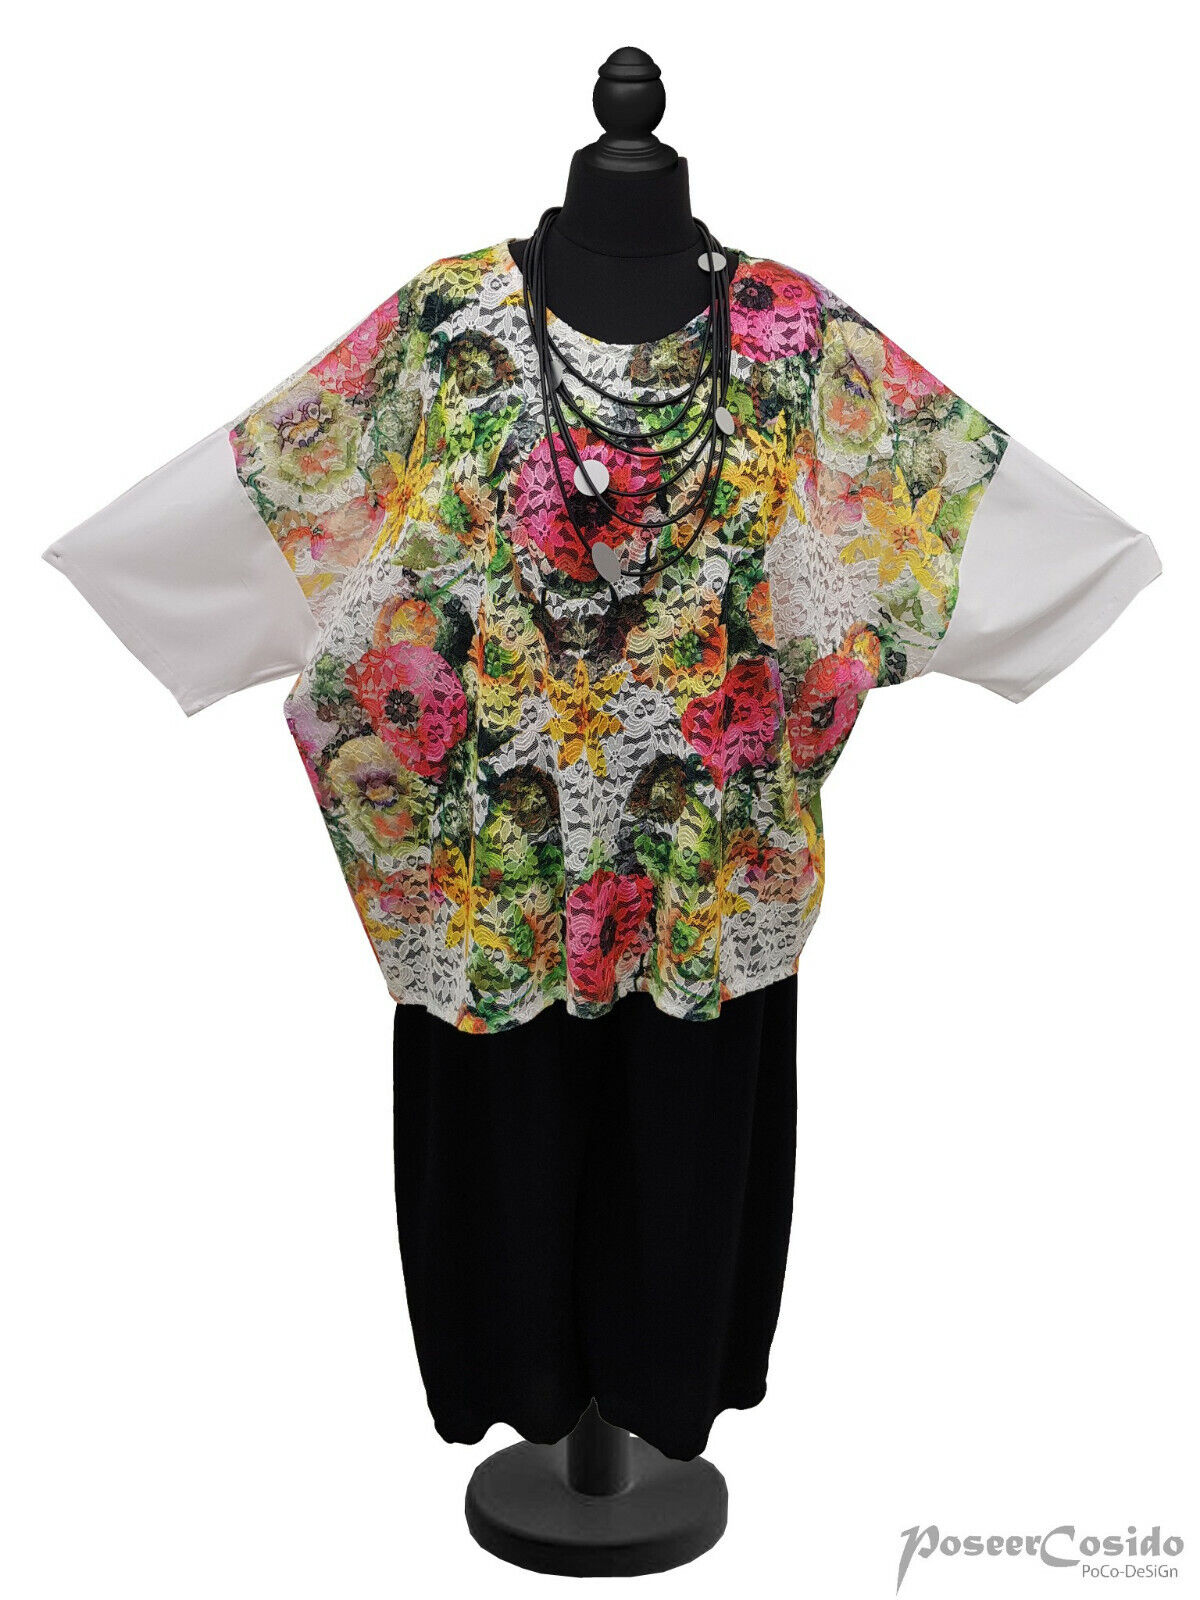 LAGENLOOK Spitze Tunika Shirt Überwurf OverGröße 48 50 52 54 56 58 XL-XXL-XXXL